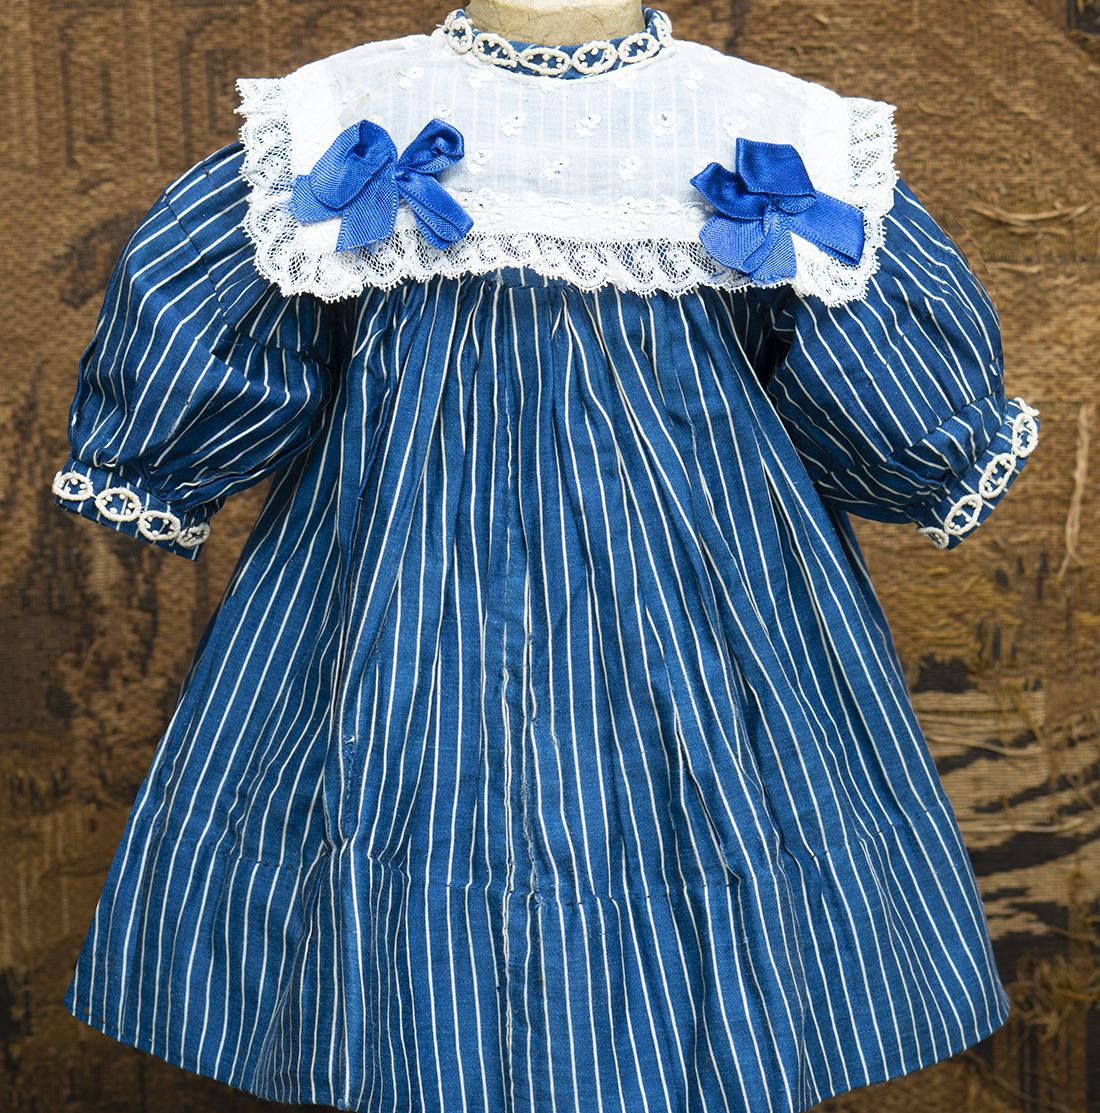 Antique Stripped dress